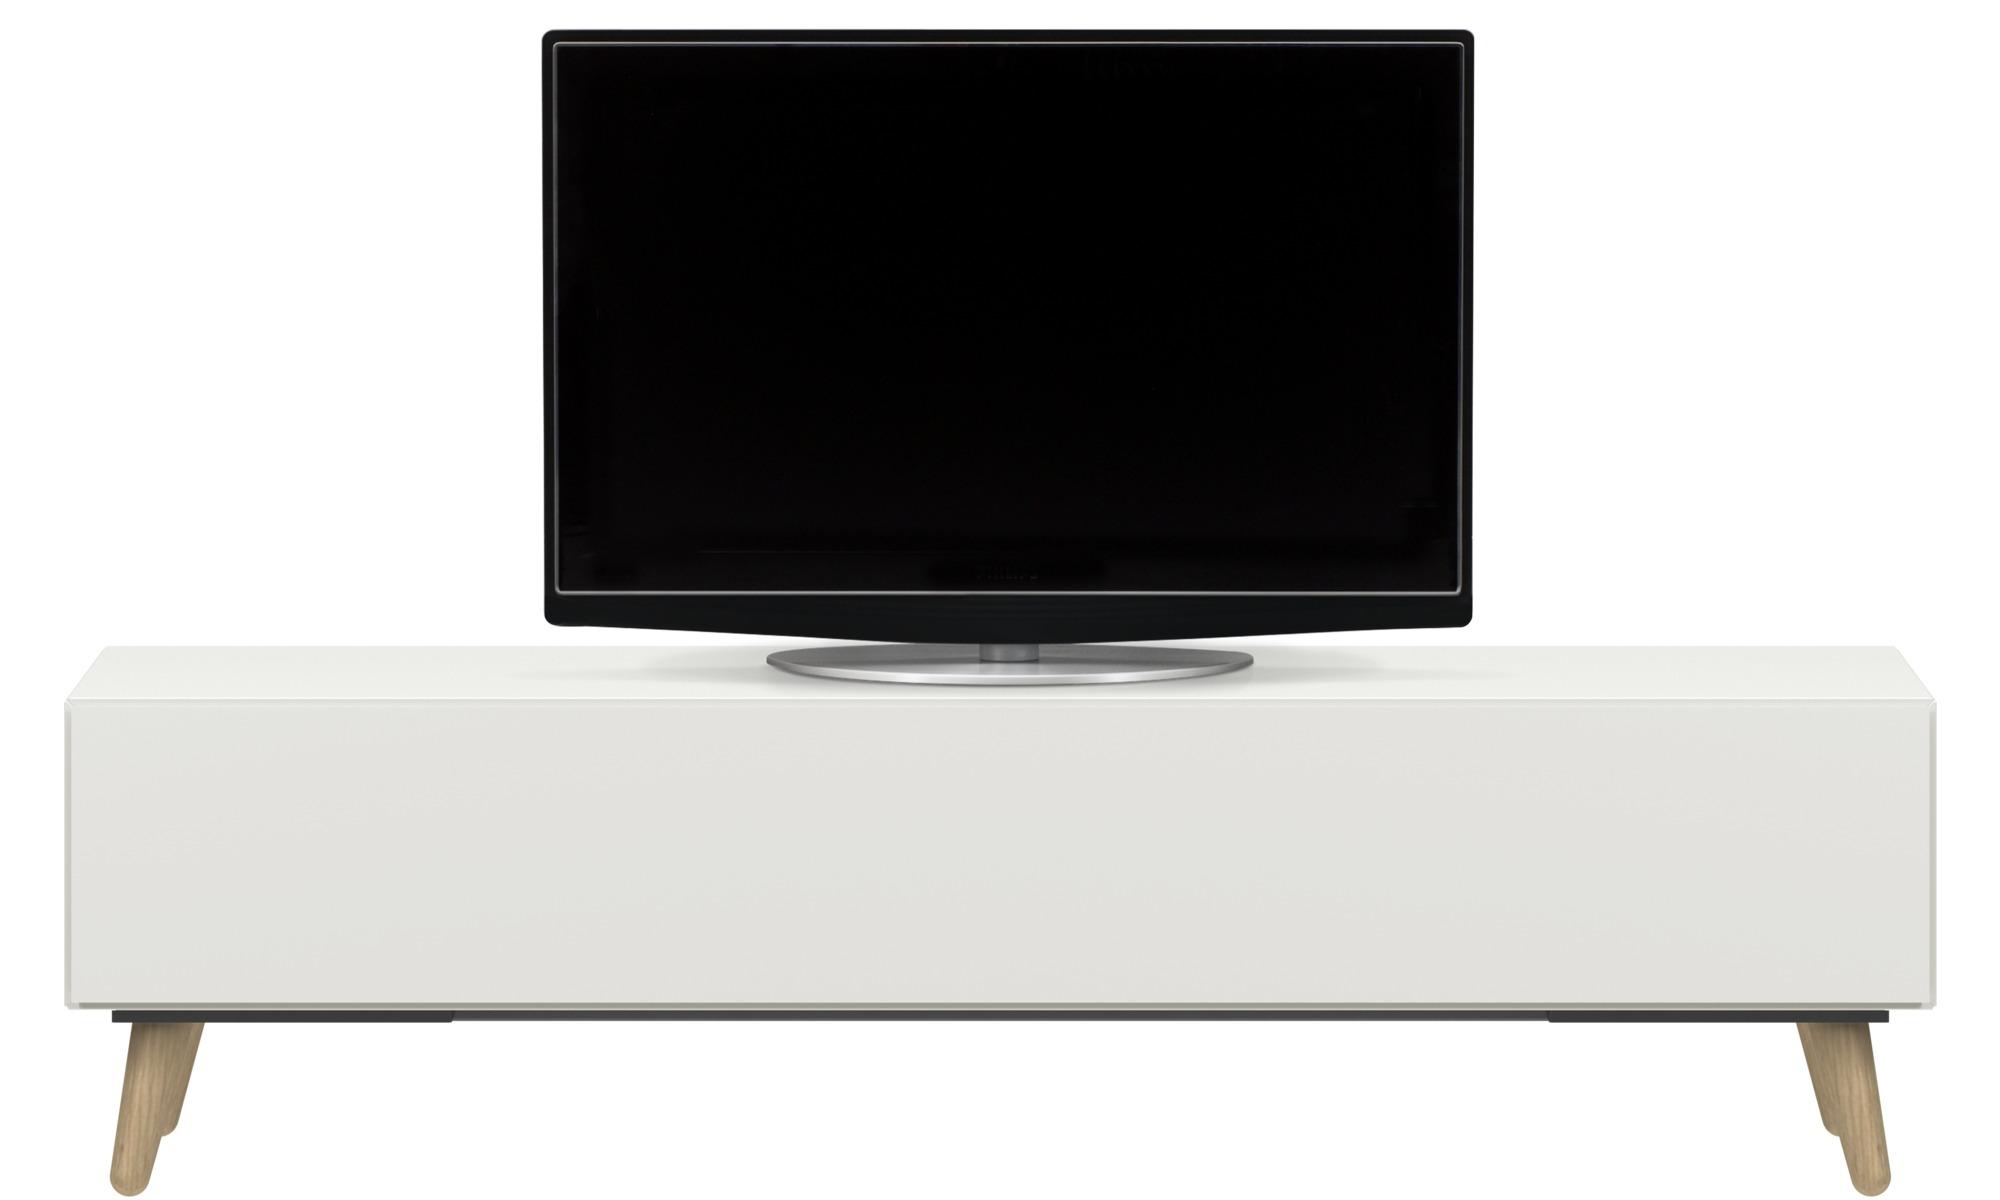 Meubles tv meuble multim dia lugano avec tiroir boconcept for Boconcept meuble tv